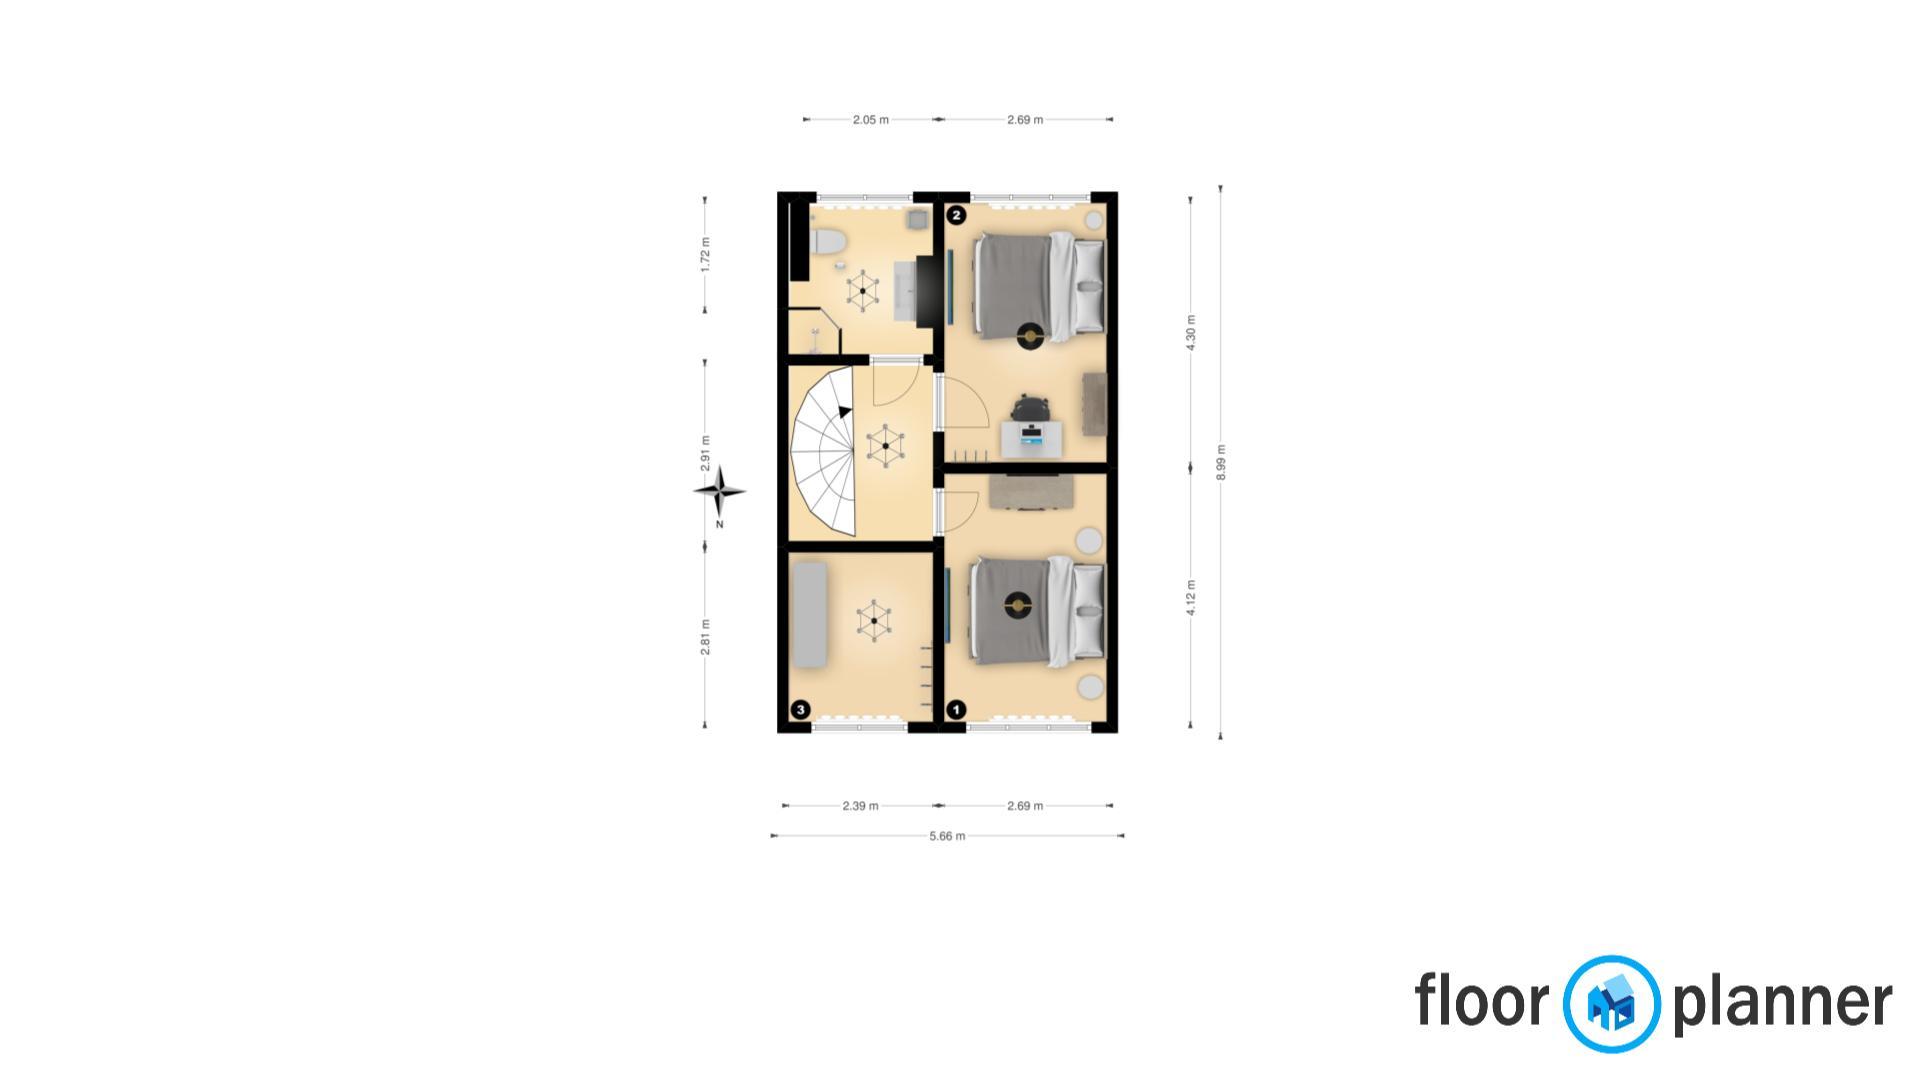 Slaapkamer 1, 2, 3 en badkamer